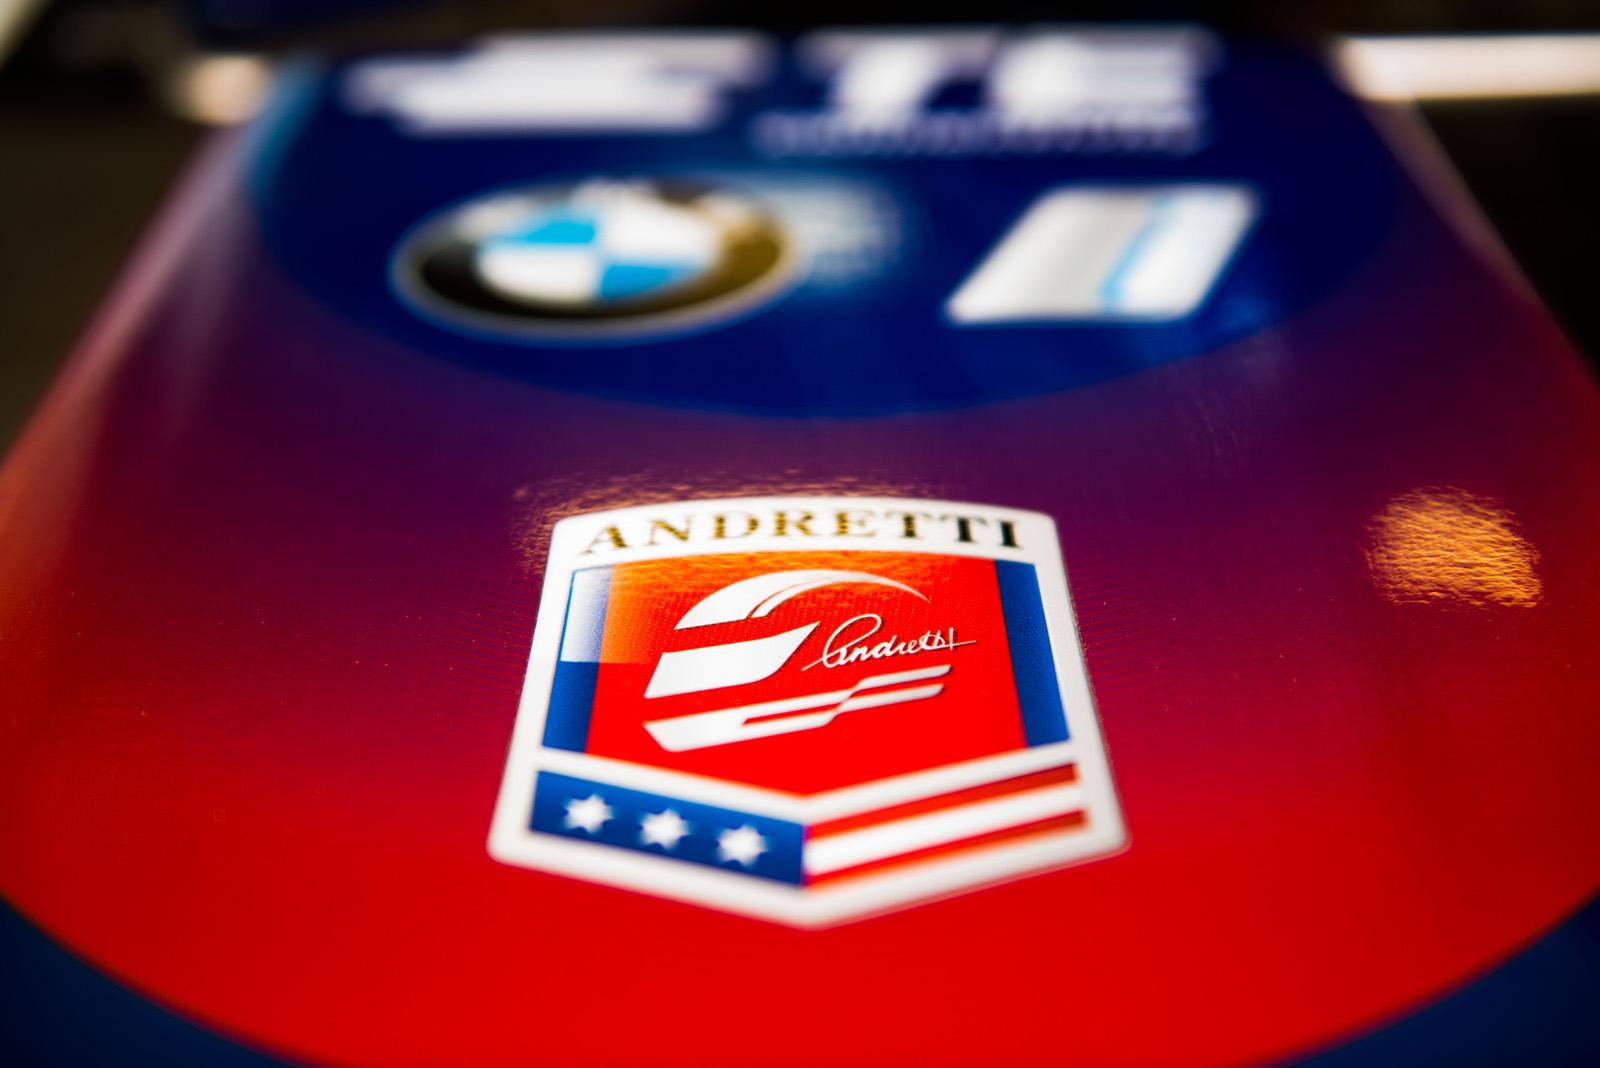   Team: MS Amlin Andretti  Car: ATEC-02   Photographer: Nat Twiss  Event: Mexico City ePrix  Circuit: Autodromo Hermanos Rodriguez  Location: Mexico City  Series: FIA Formula E  Season: 2016-2017  Country: MX 